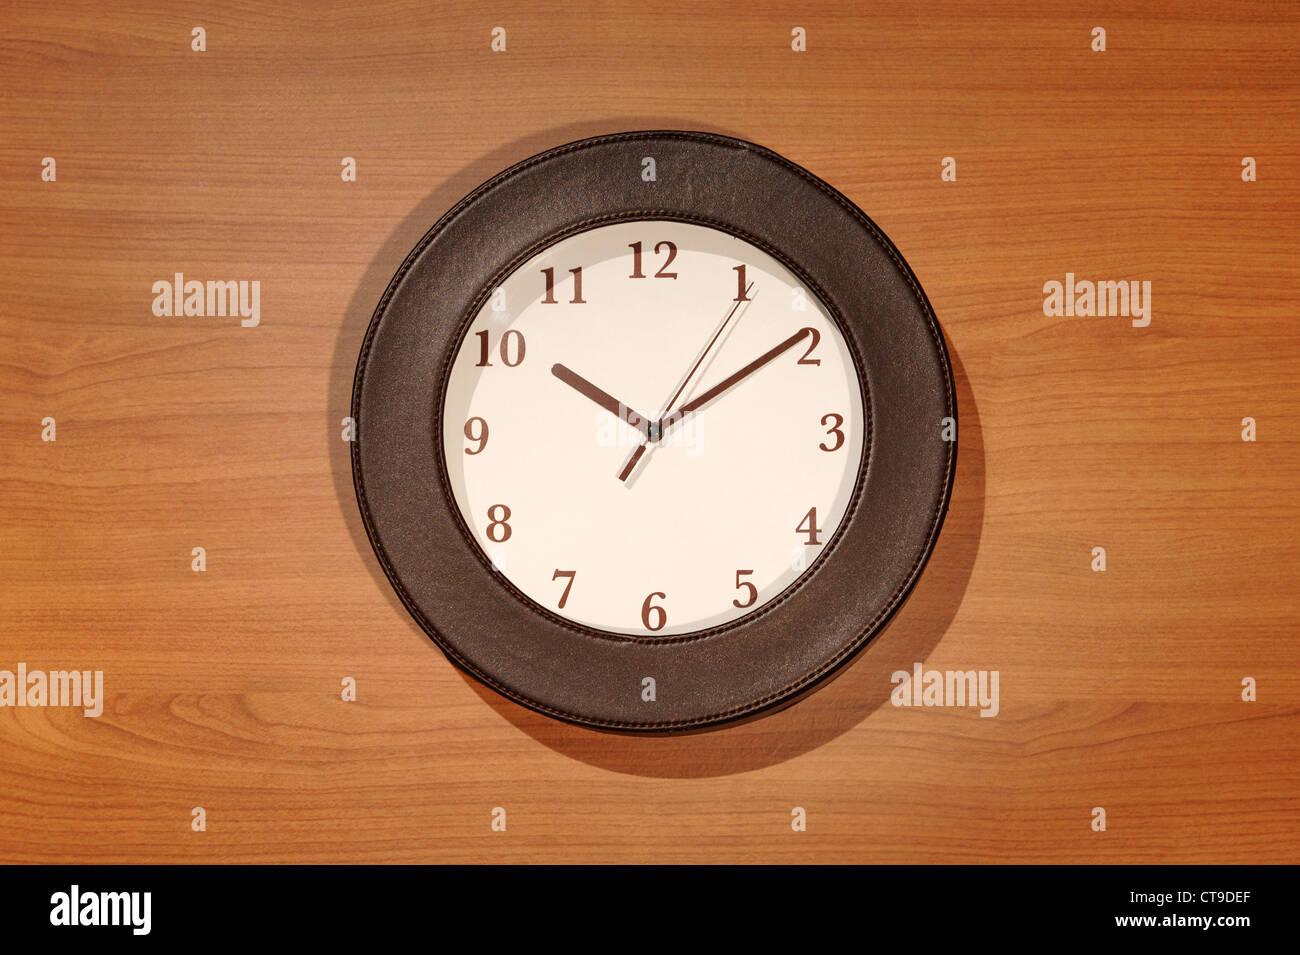 Reloj marrón Imagen De Stock